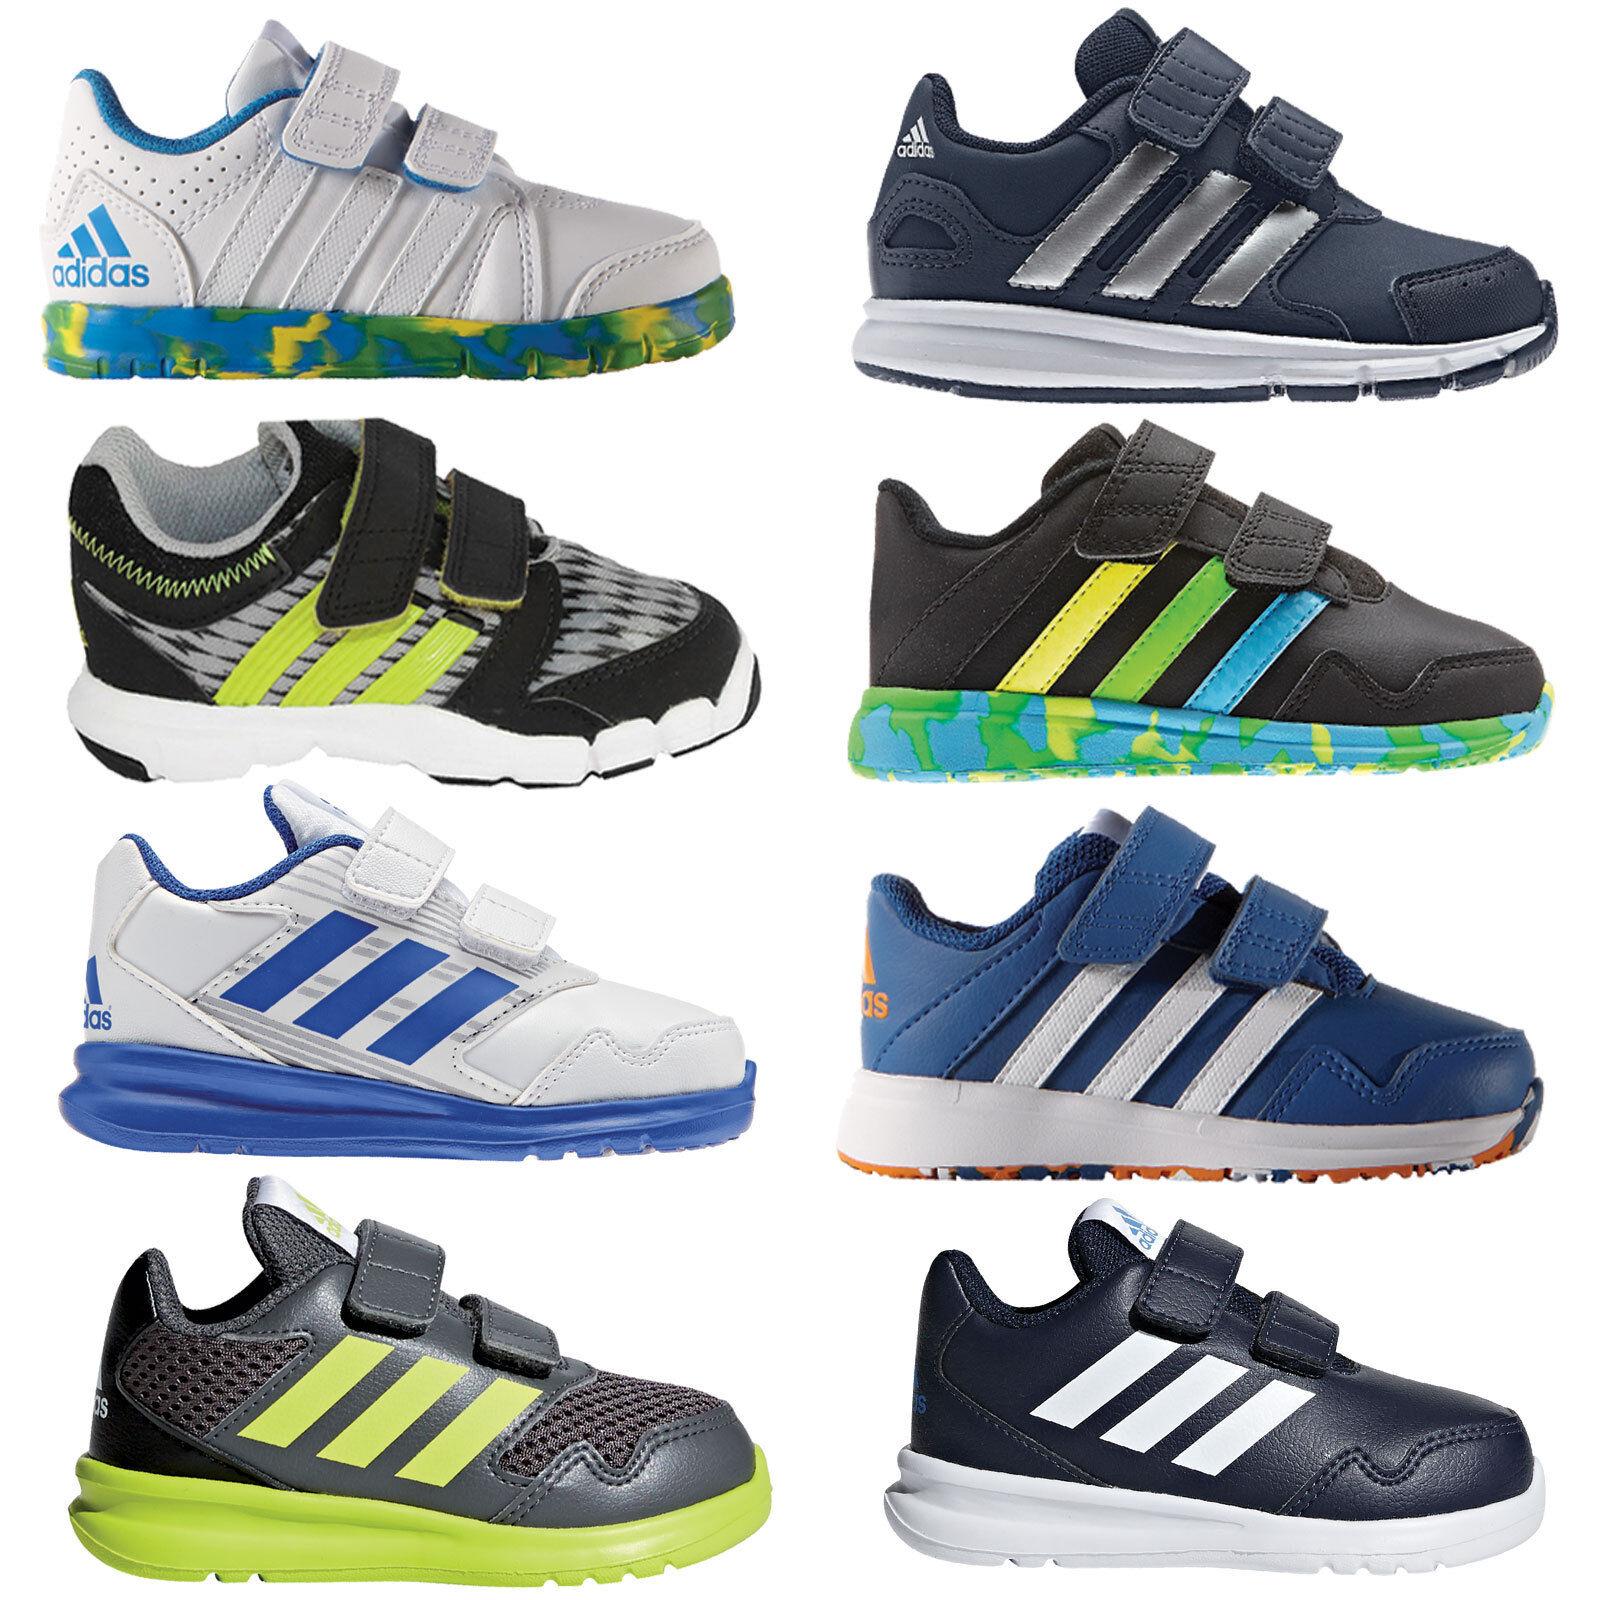 adidas Performance Kleinkind-Schuhe Jungen-Sneaker Klettverschluss-Turnschuhe